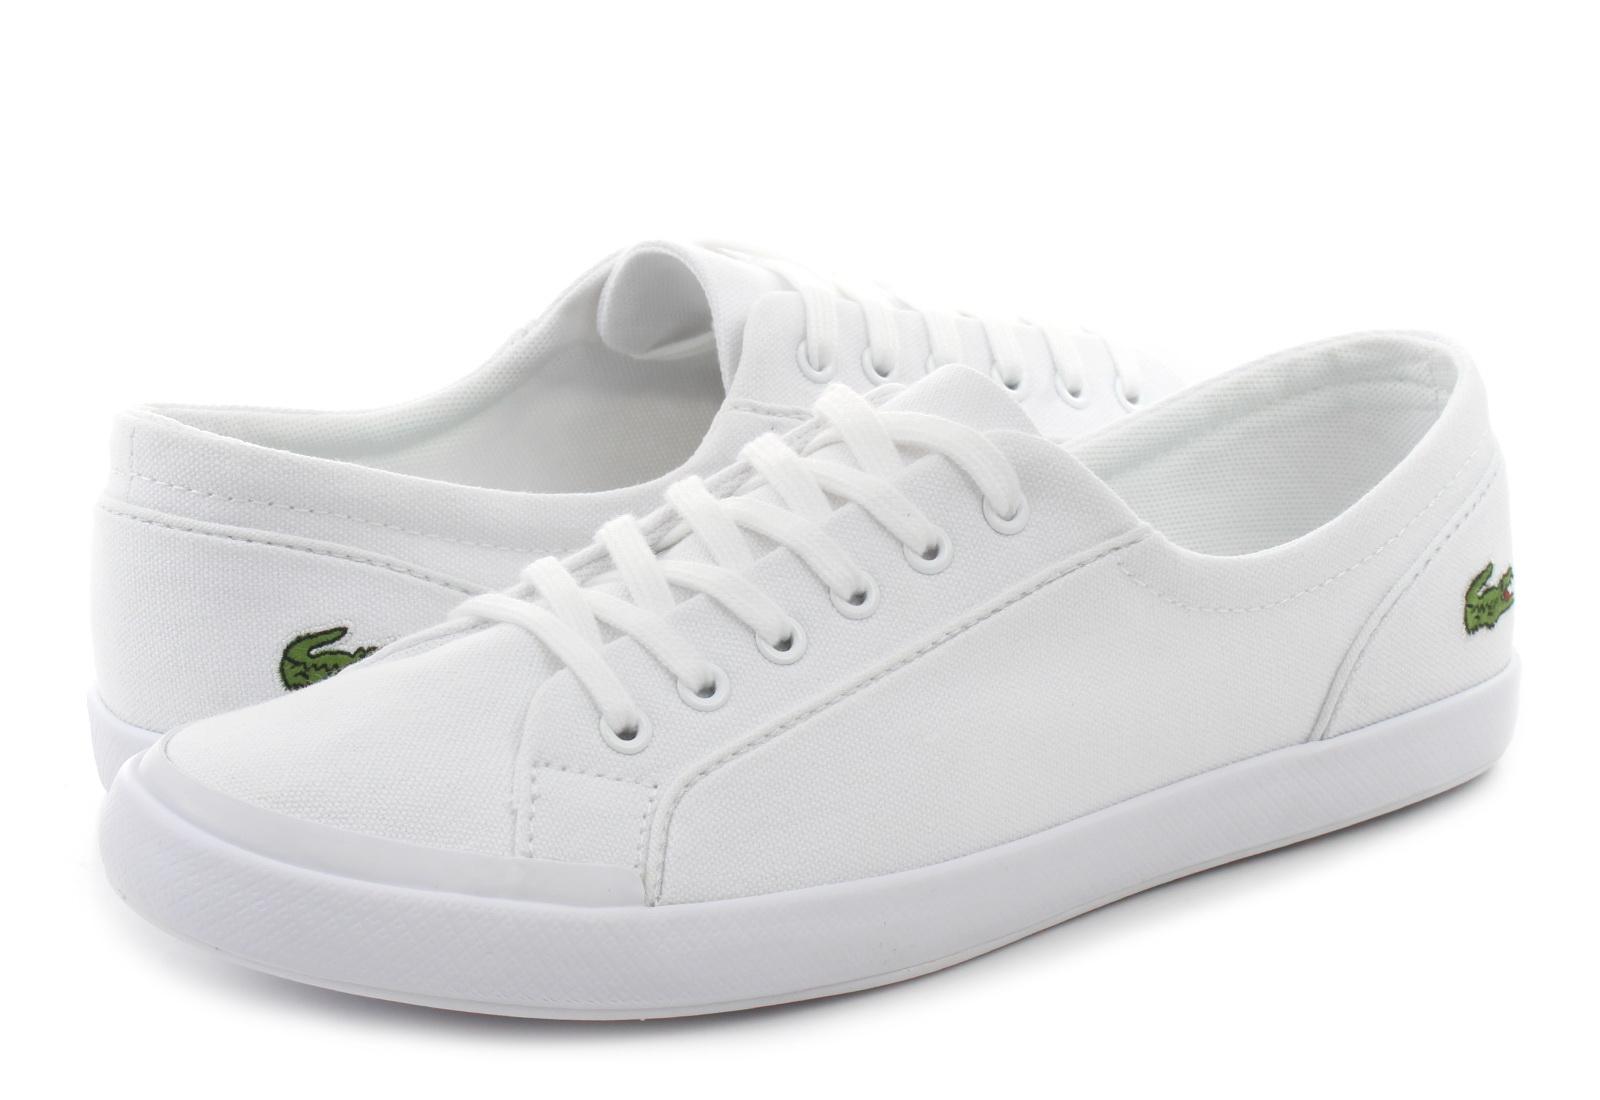 Lacoste Cipő - Lancelle - 191SPW0136-001 - Office Shoes Magyarország b218851e62